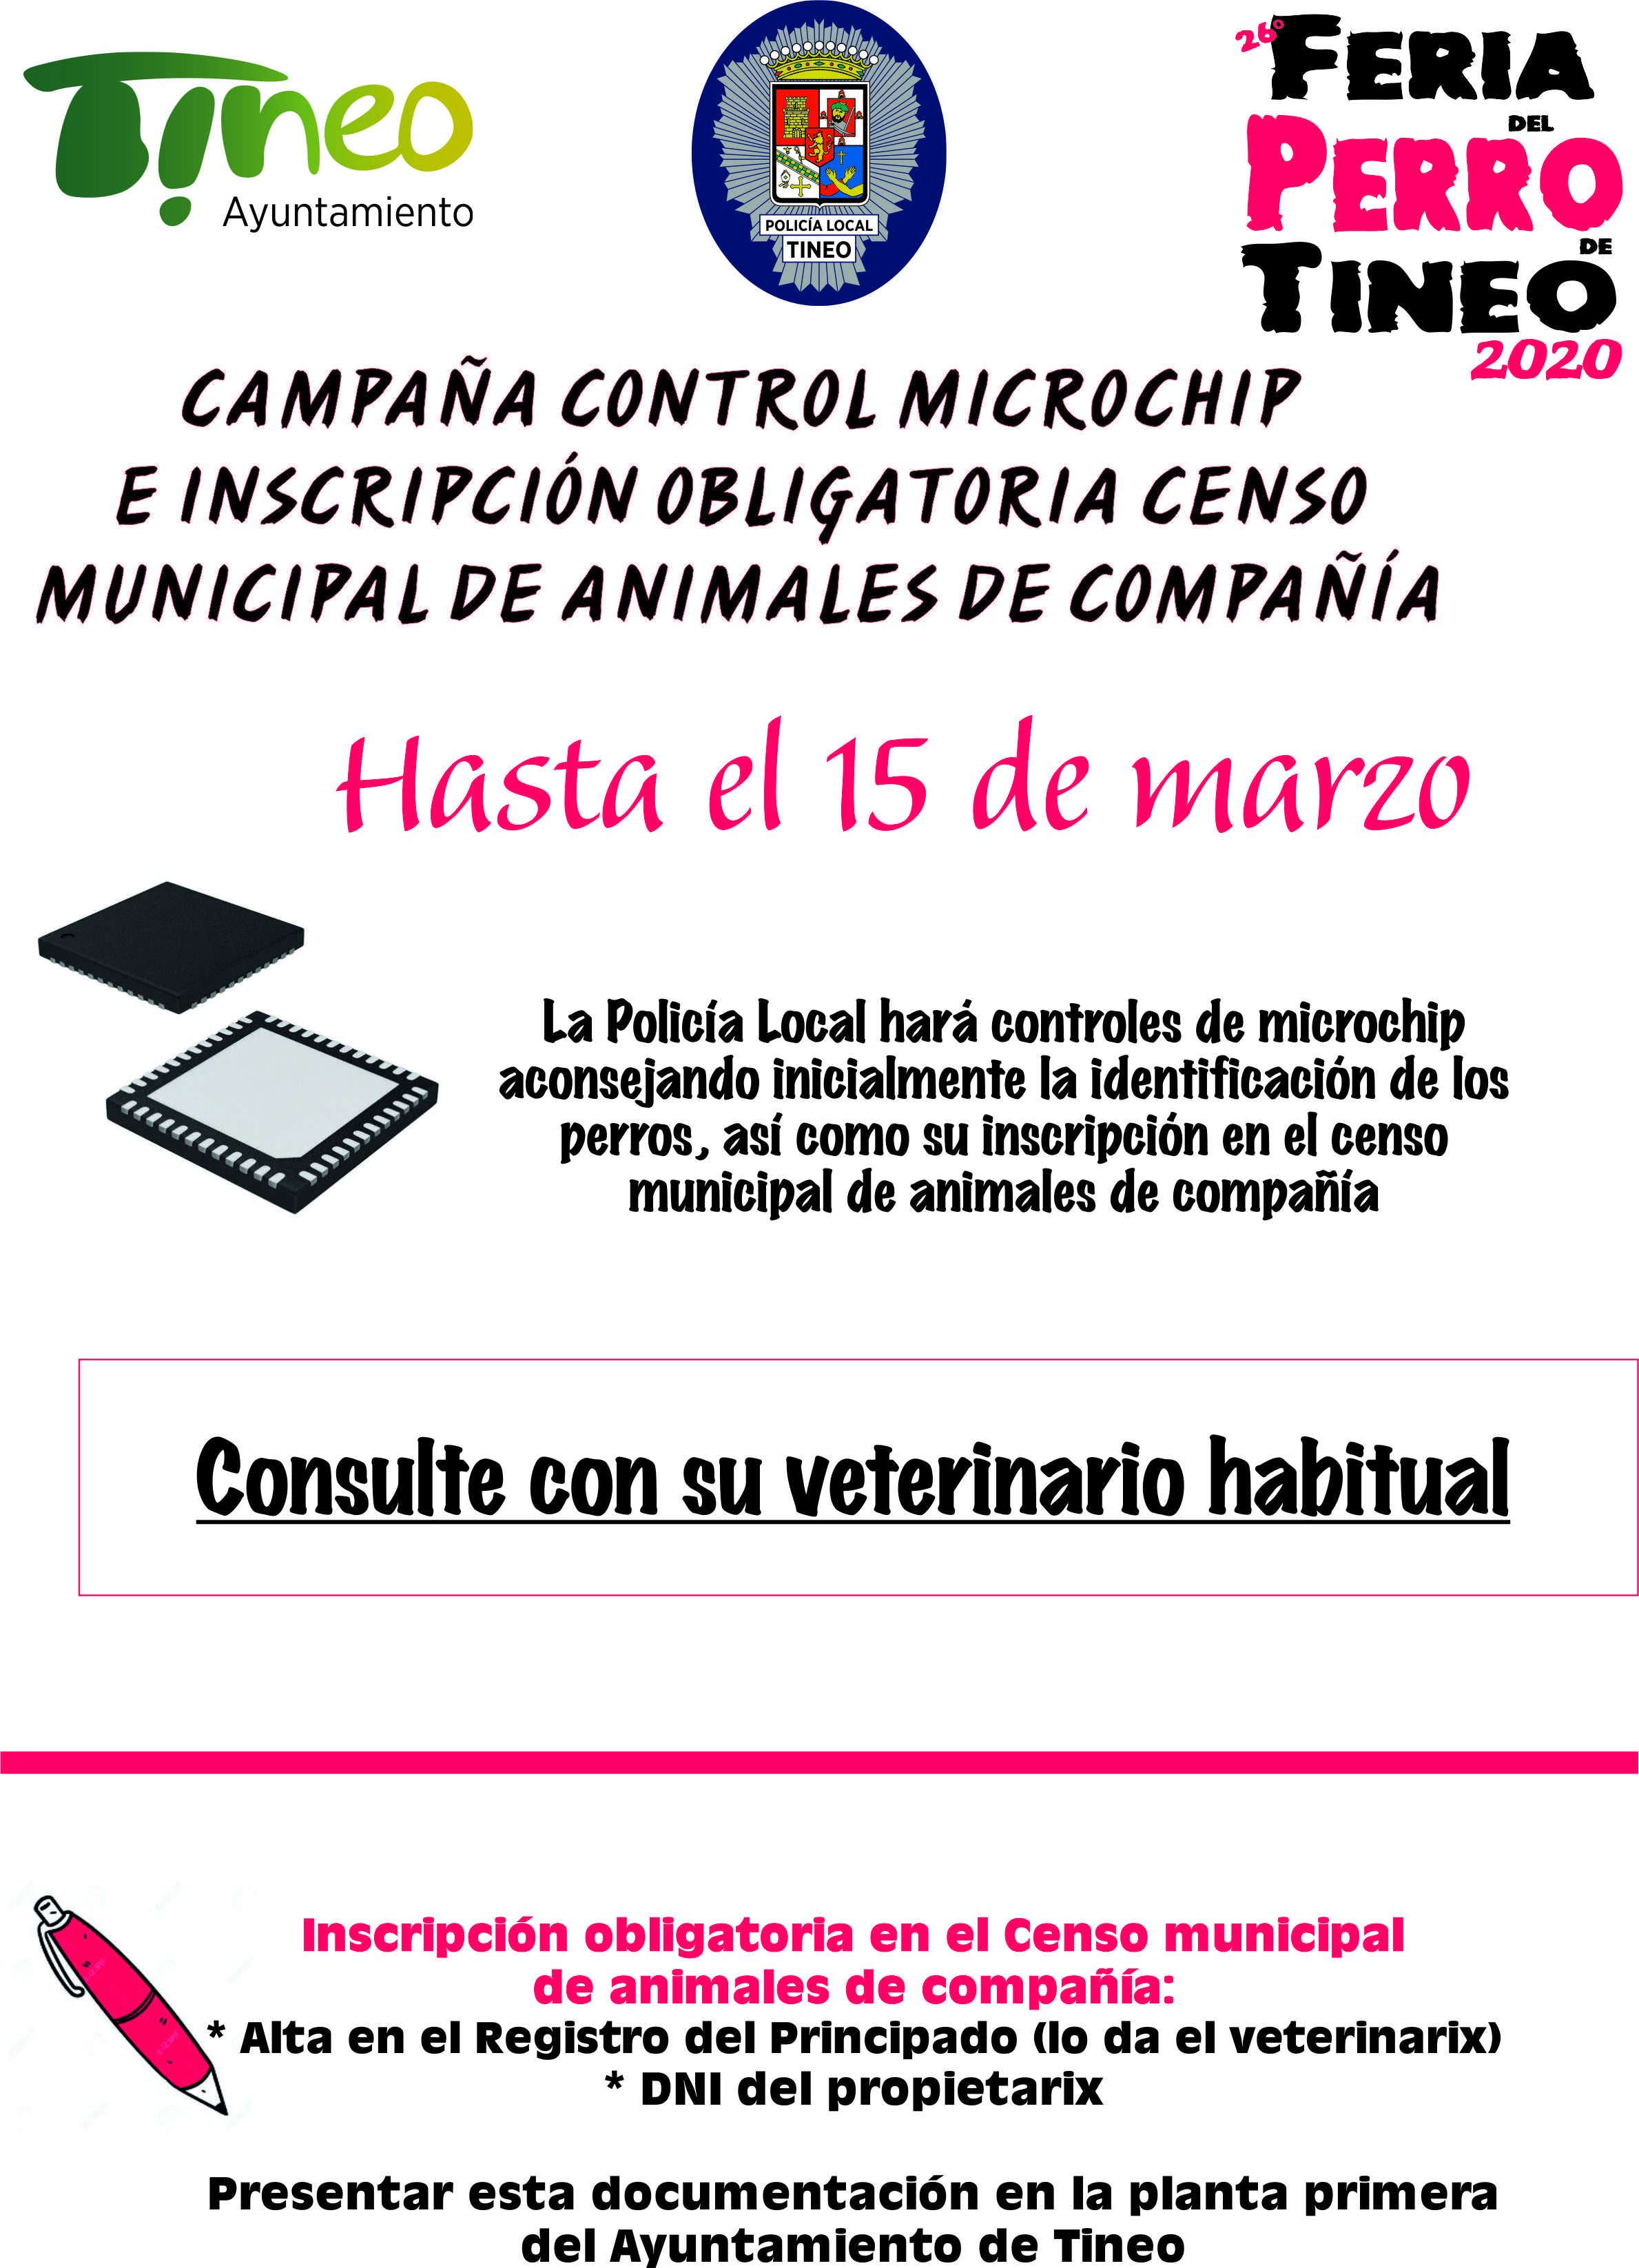 Campaña control de microchip  e inscripción obligatoria en el censo municipal de animales de compañía